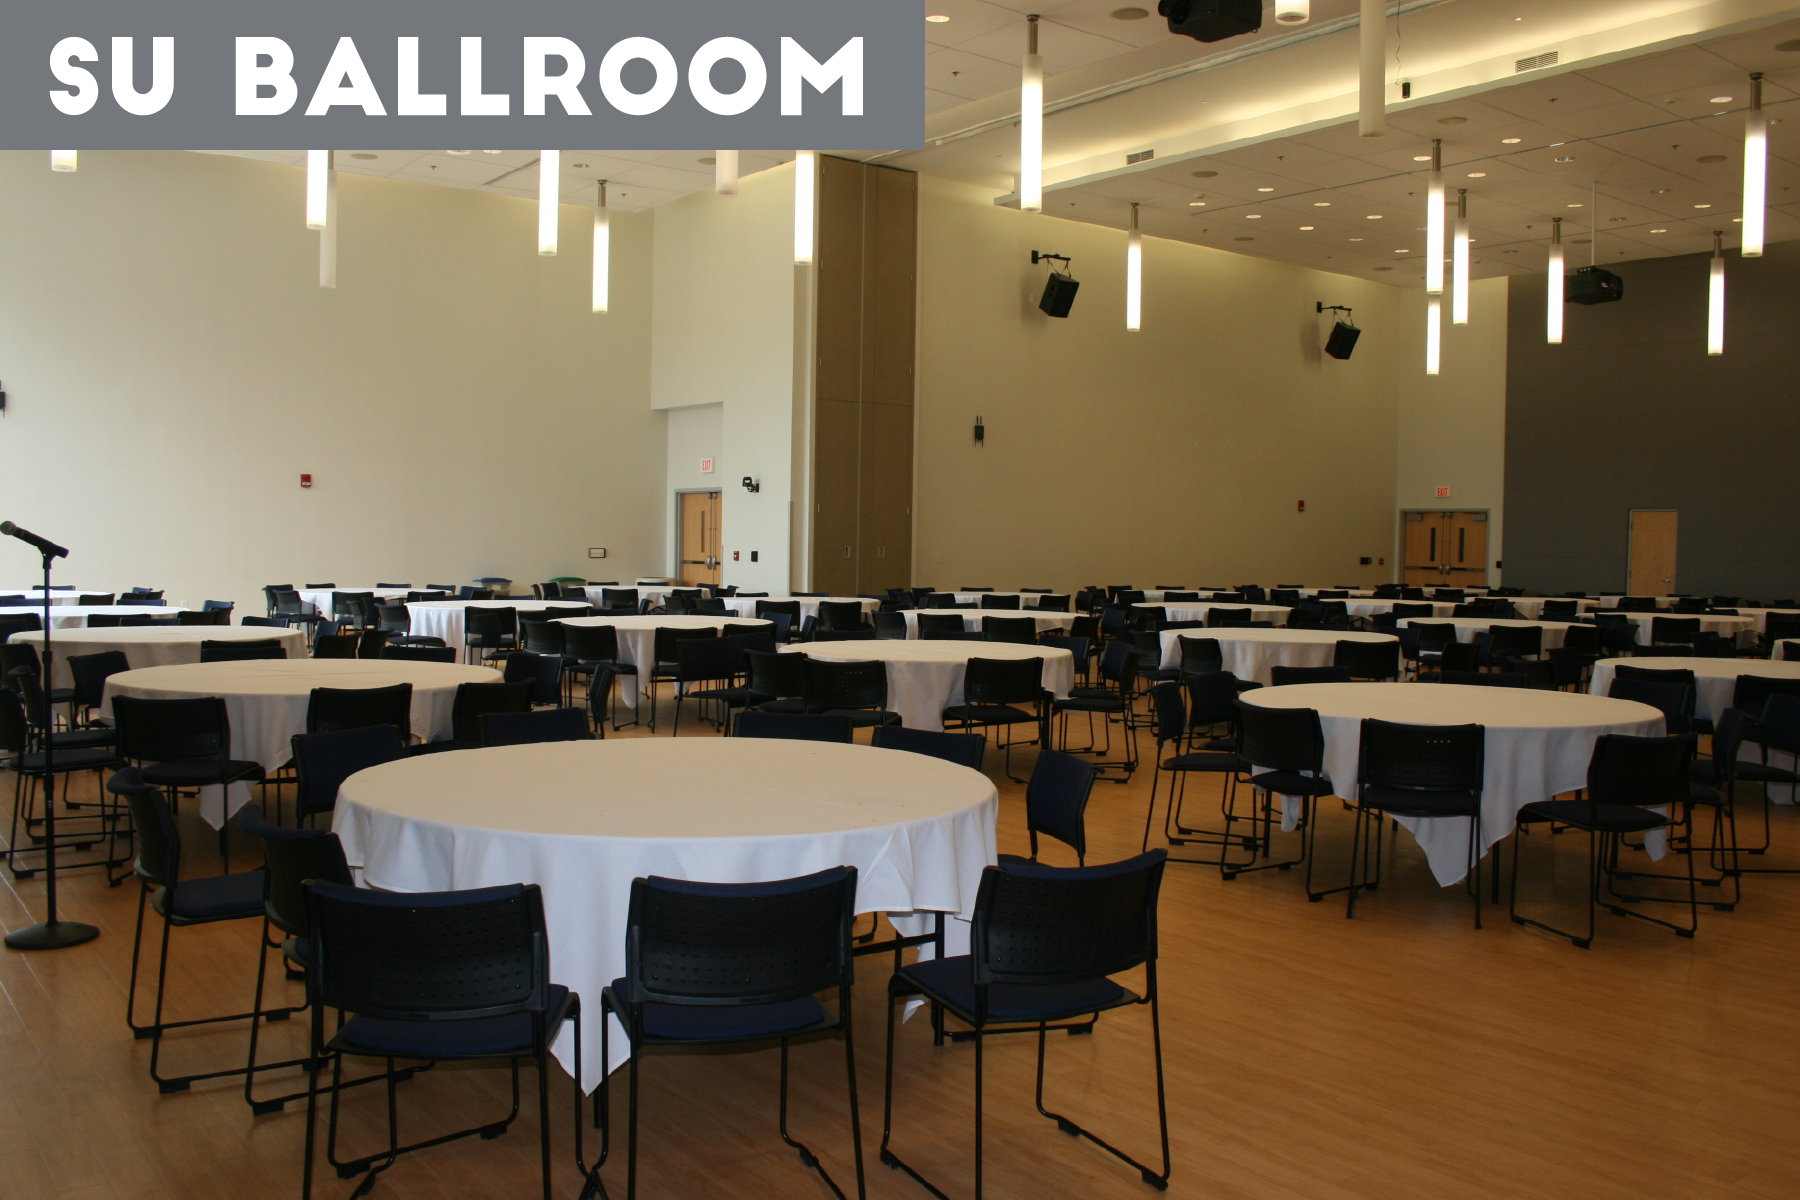 Student Union Ballroom